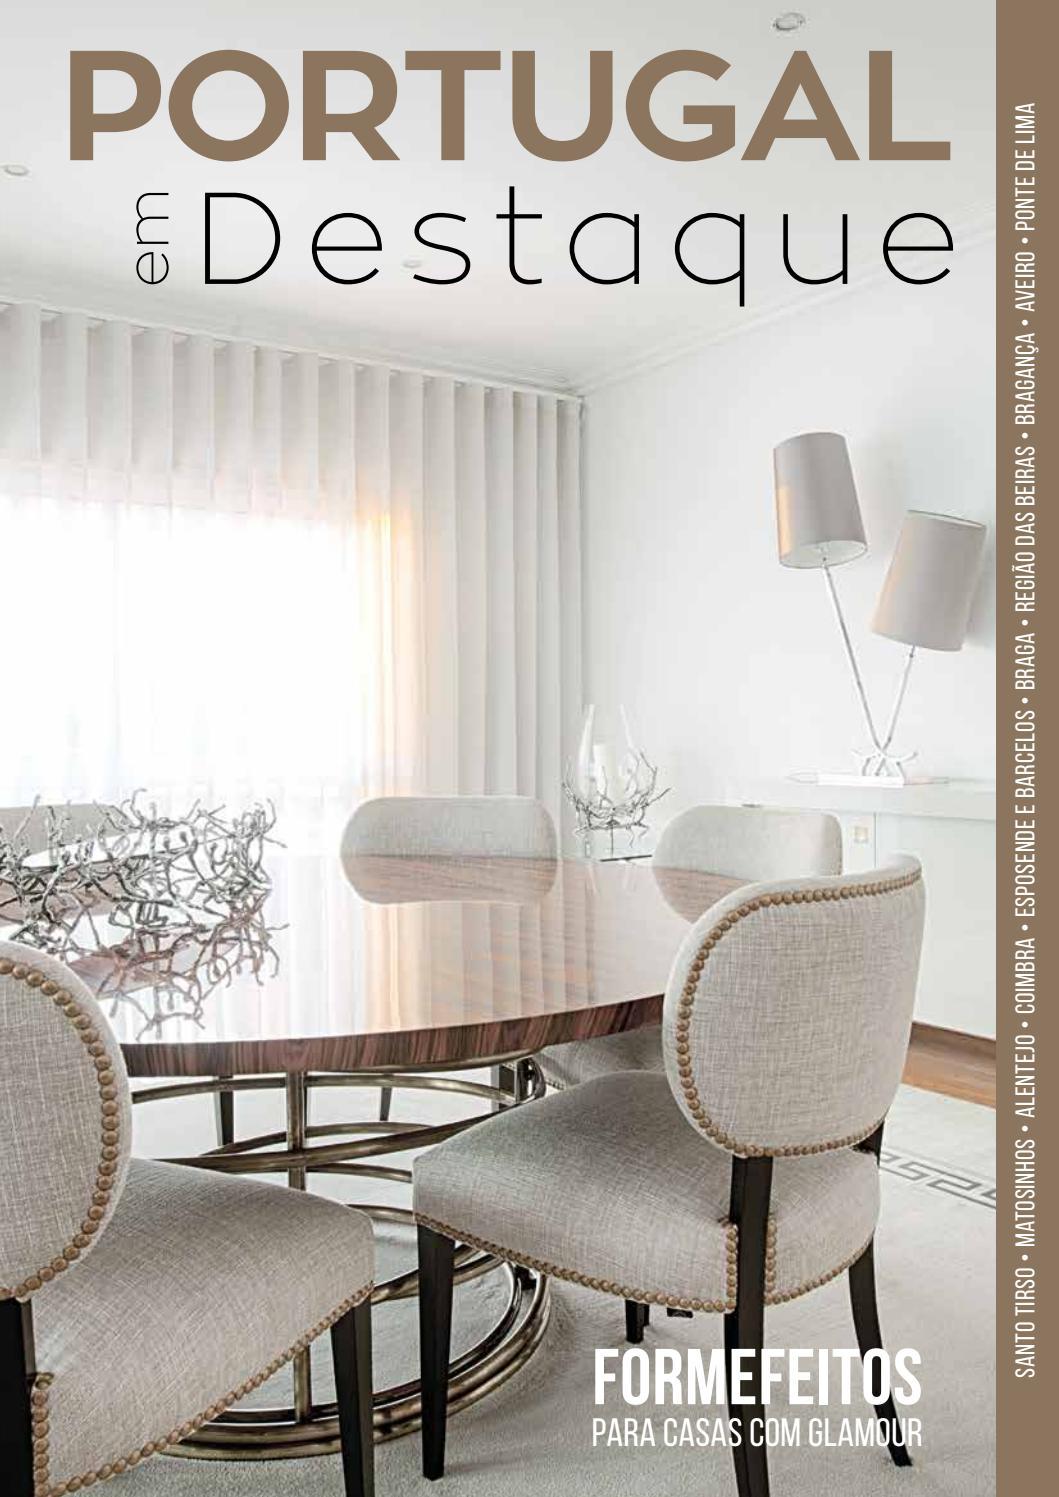 Edição n.º30 by Portugal em Destaque - issuu 1fa454f2feee8